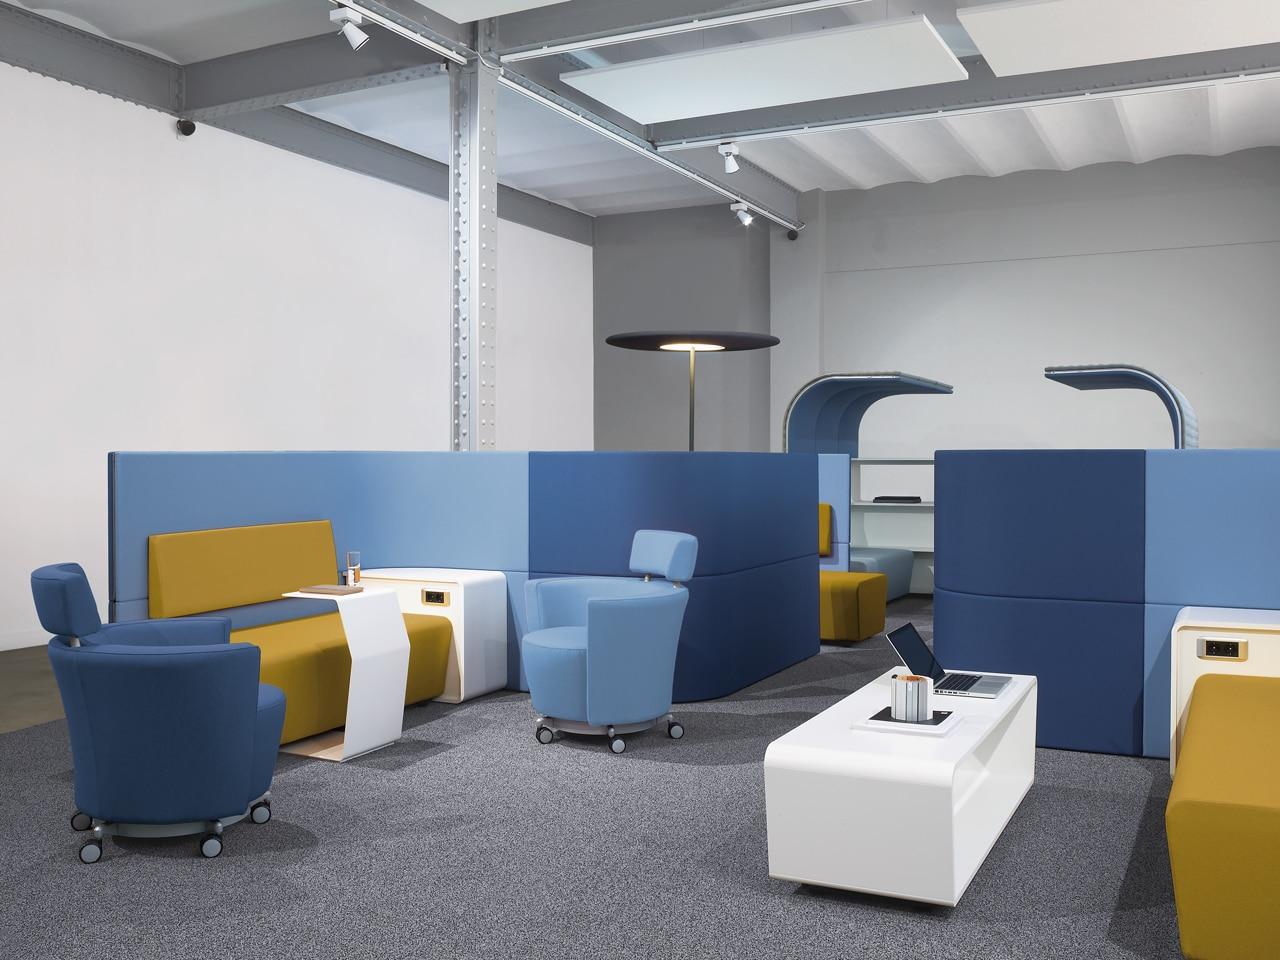 Haworth catalog europe may 2012 564 neu acrew4u - Hayworth office furniture ...